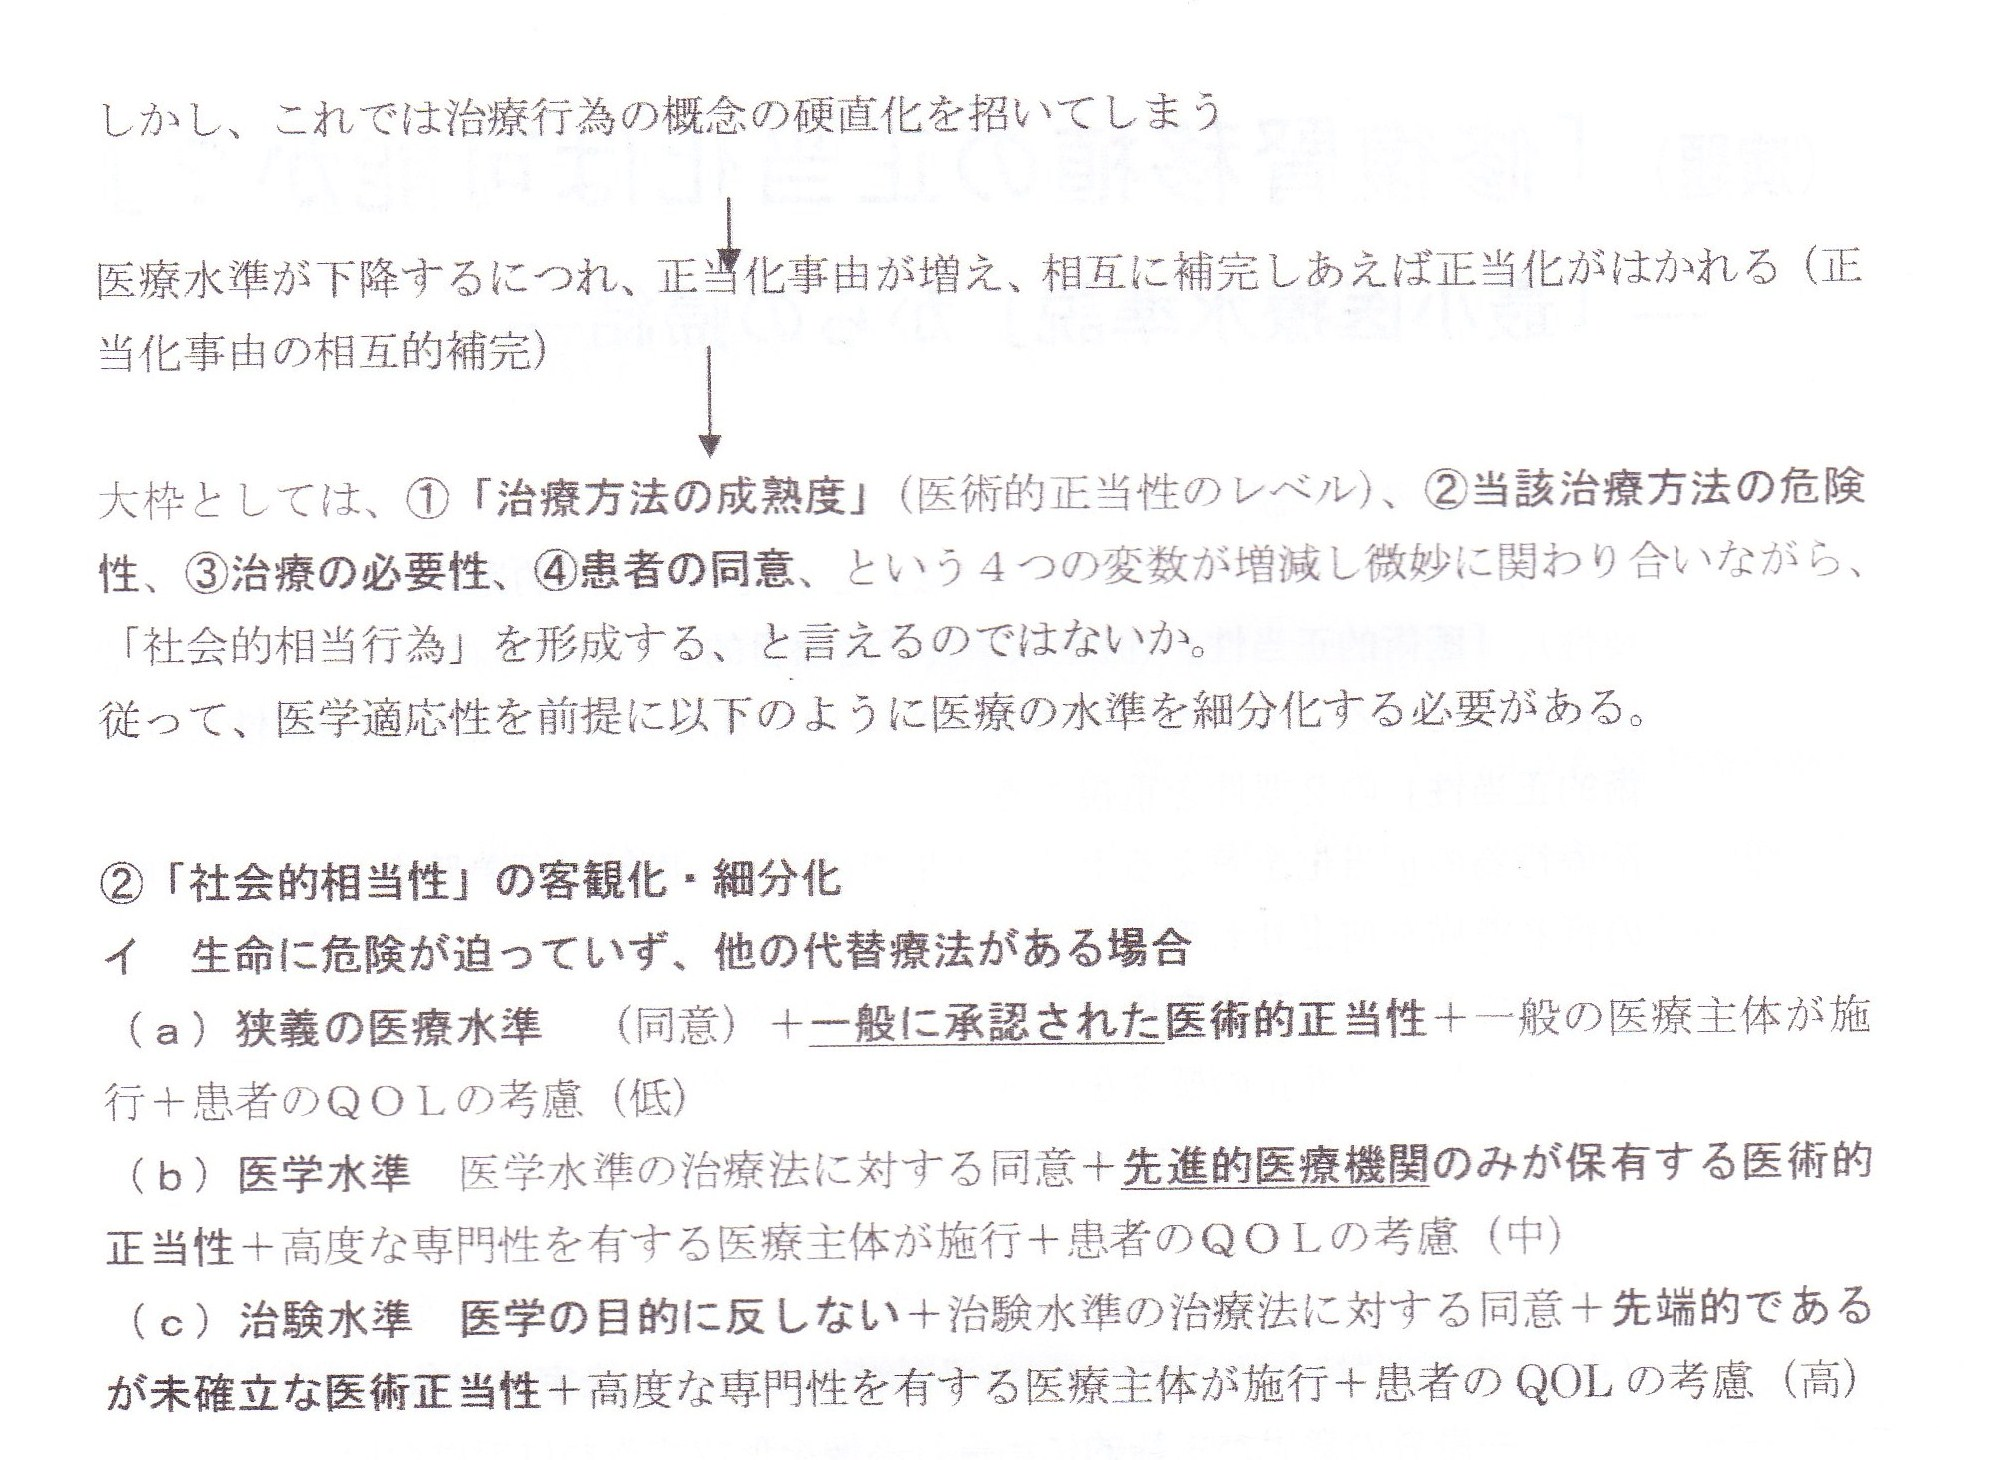 22.5.30NPO法人・第2回総会・記念講演会_e0163726_1535258.jpg